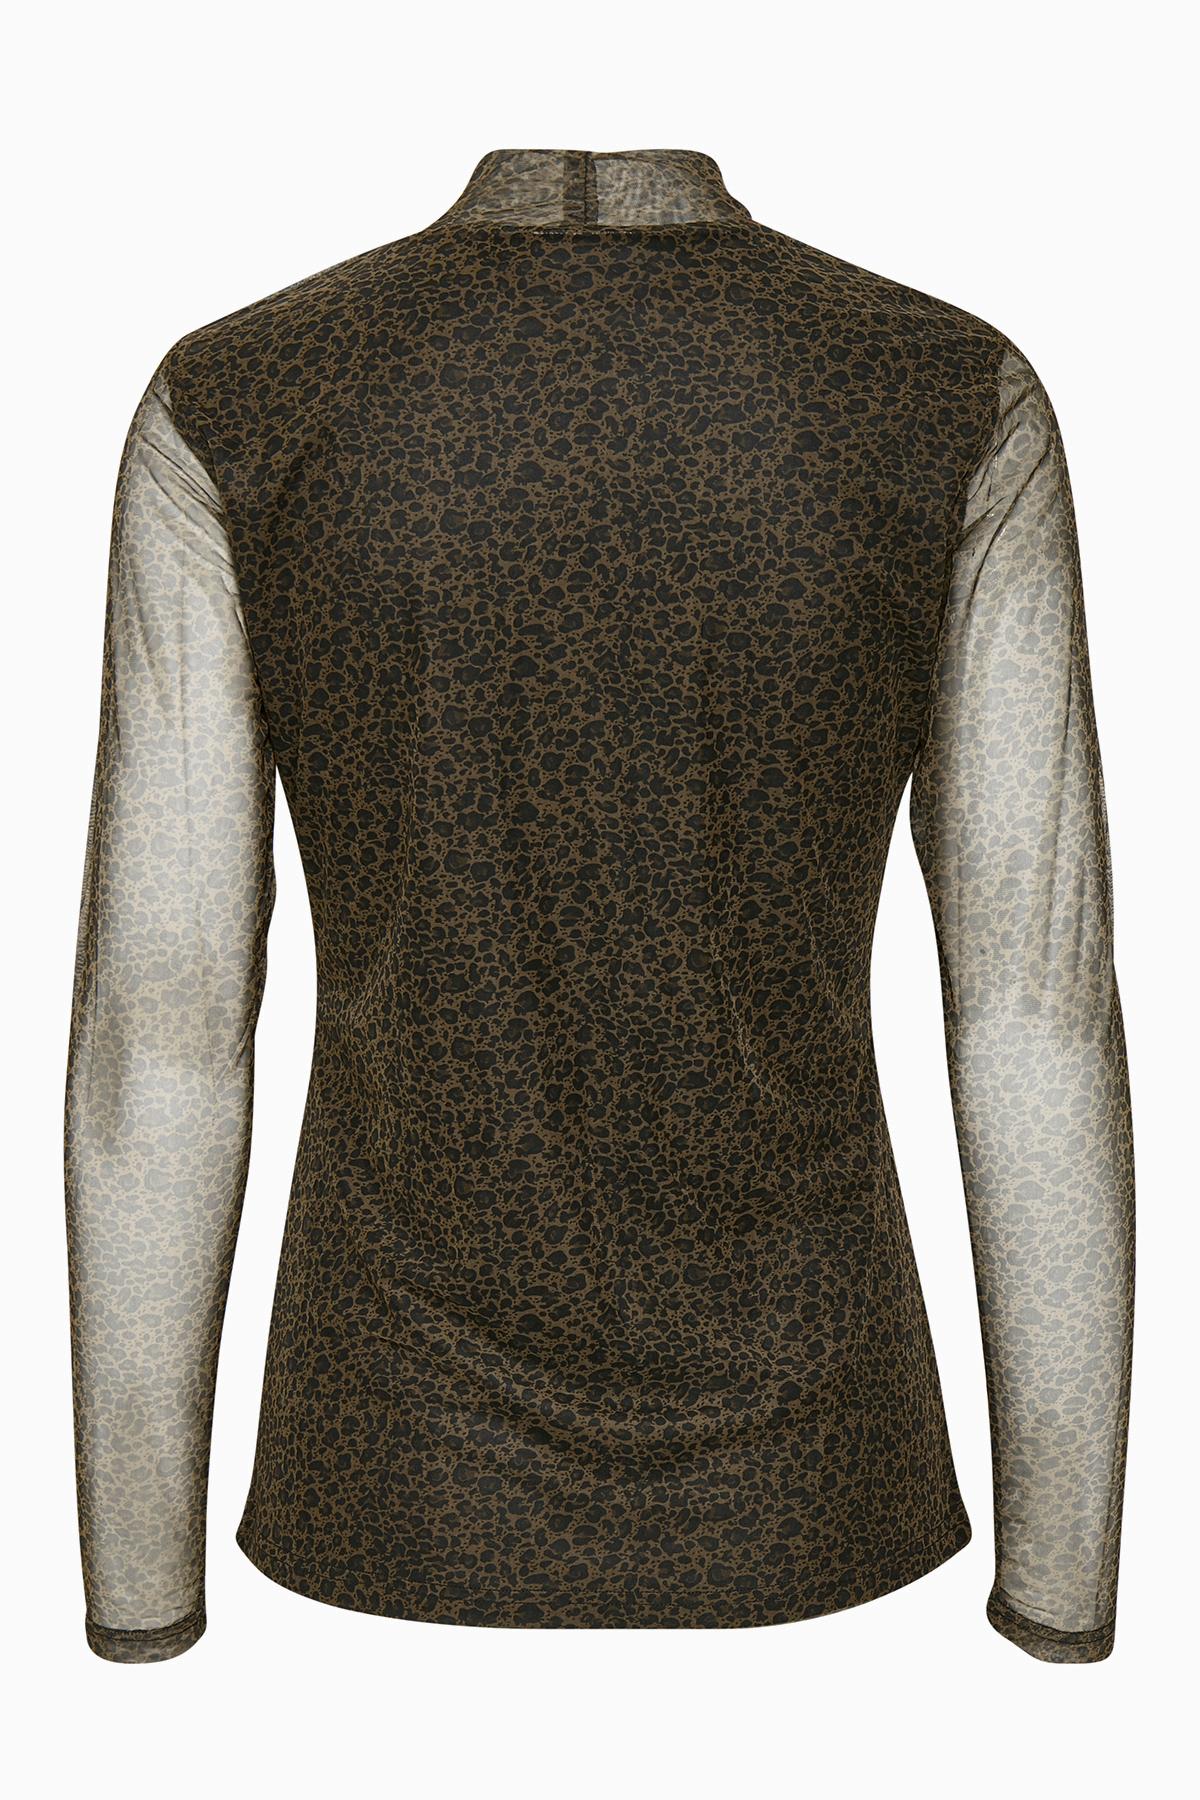 Schwarz Langarm T-Shirt von Kaffe – Shoppen SieSchwarz Langarm T-Shirt ab Gr. XS-XXL hier